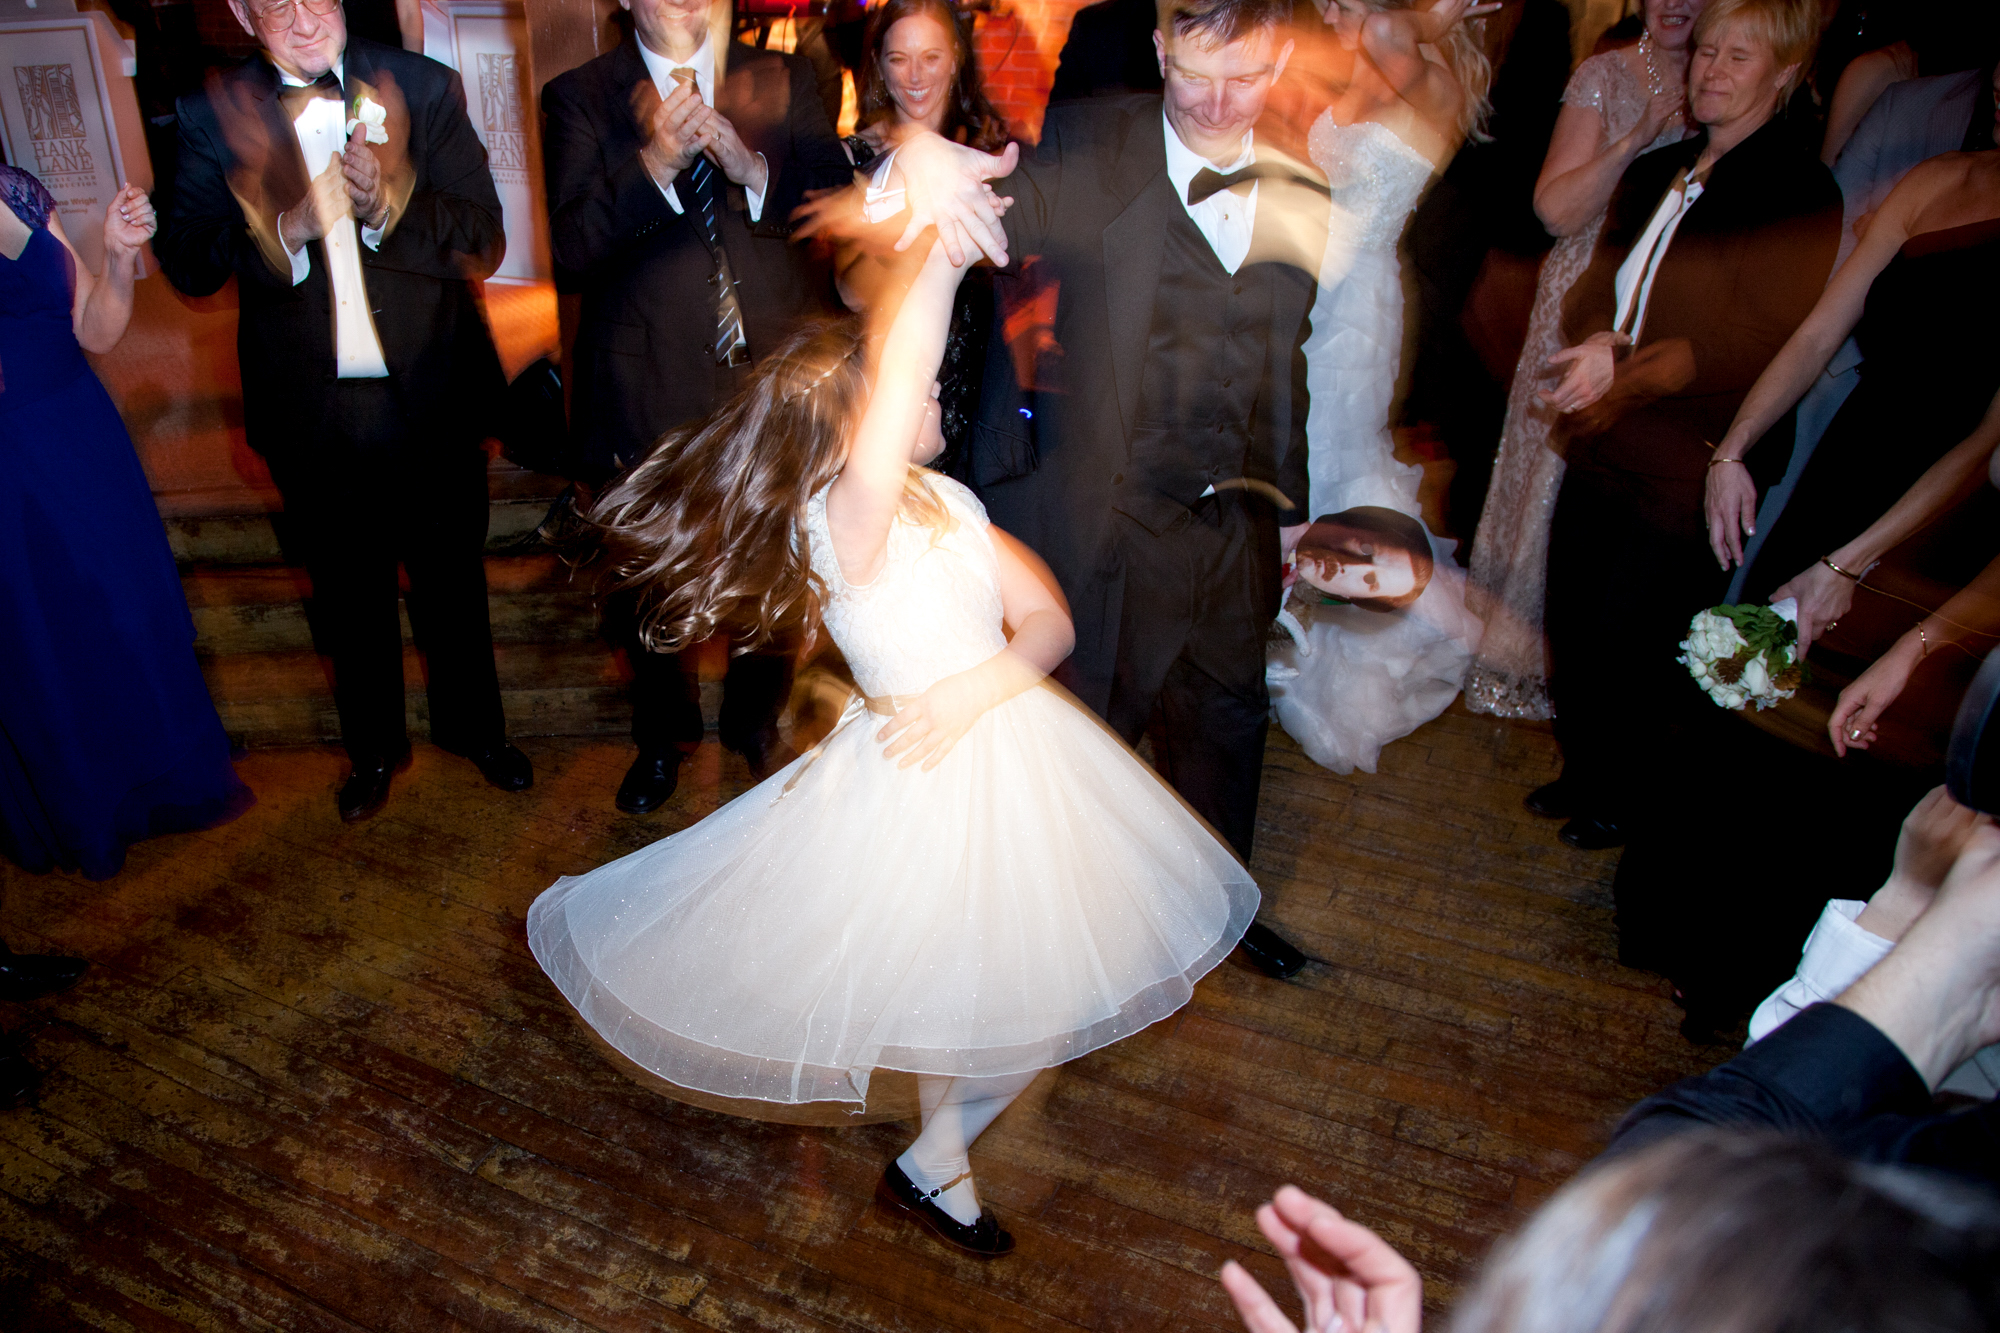 077_CarlyGaebe_SteadfastStudio_WeddingPhotography_NewYorkCity_LongIslandCity_MetropolitanBuilding_Winter_Romantic_Vintage_Warehouse_Dancing_Kids_Flowergirl.jpg